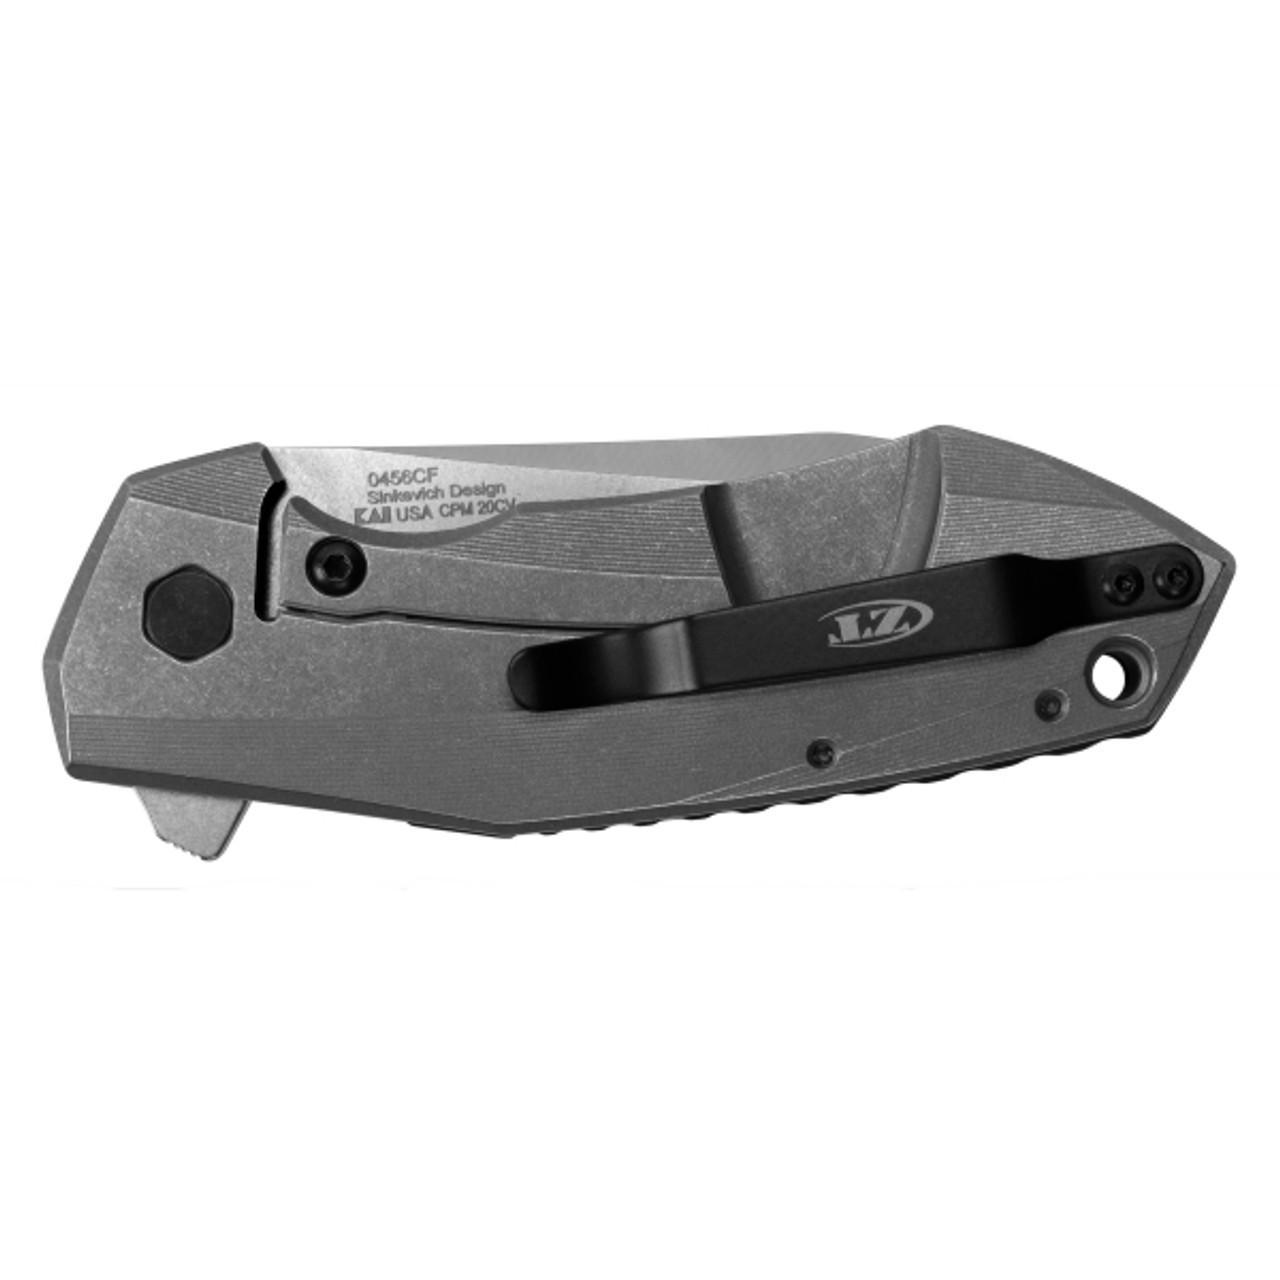 Zero Tolerance Sprint Run 0456CF Carbon Fiber Flipper Knife, Satin Blade